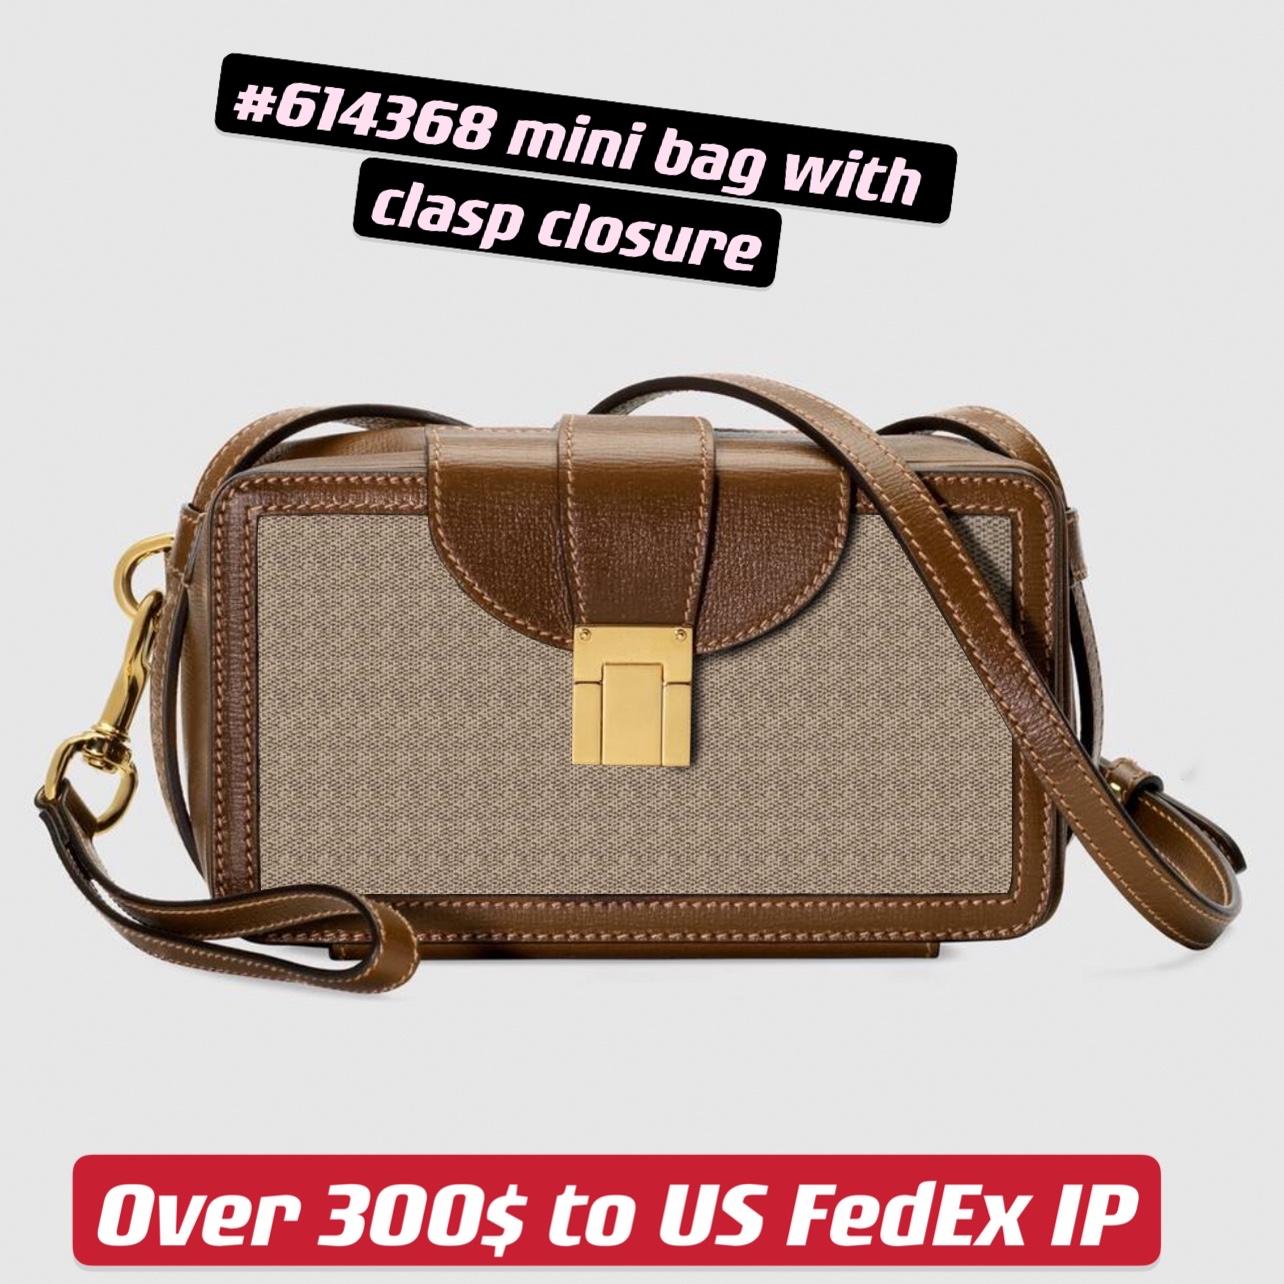 Mini Bag with Clasp Closure Square Flap 614368 Women Petite Trunk Shape Lovely Vintage Crossbody